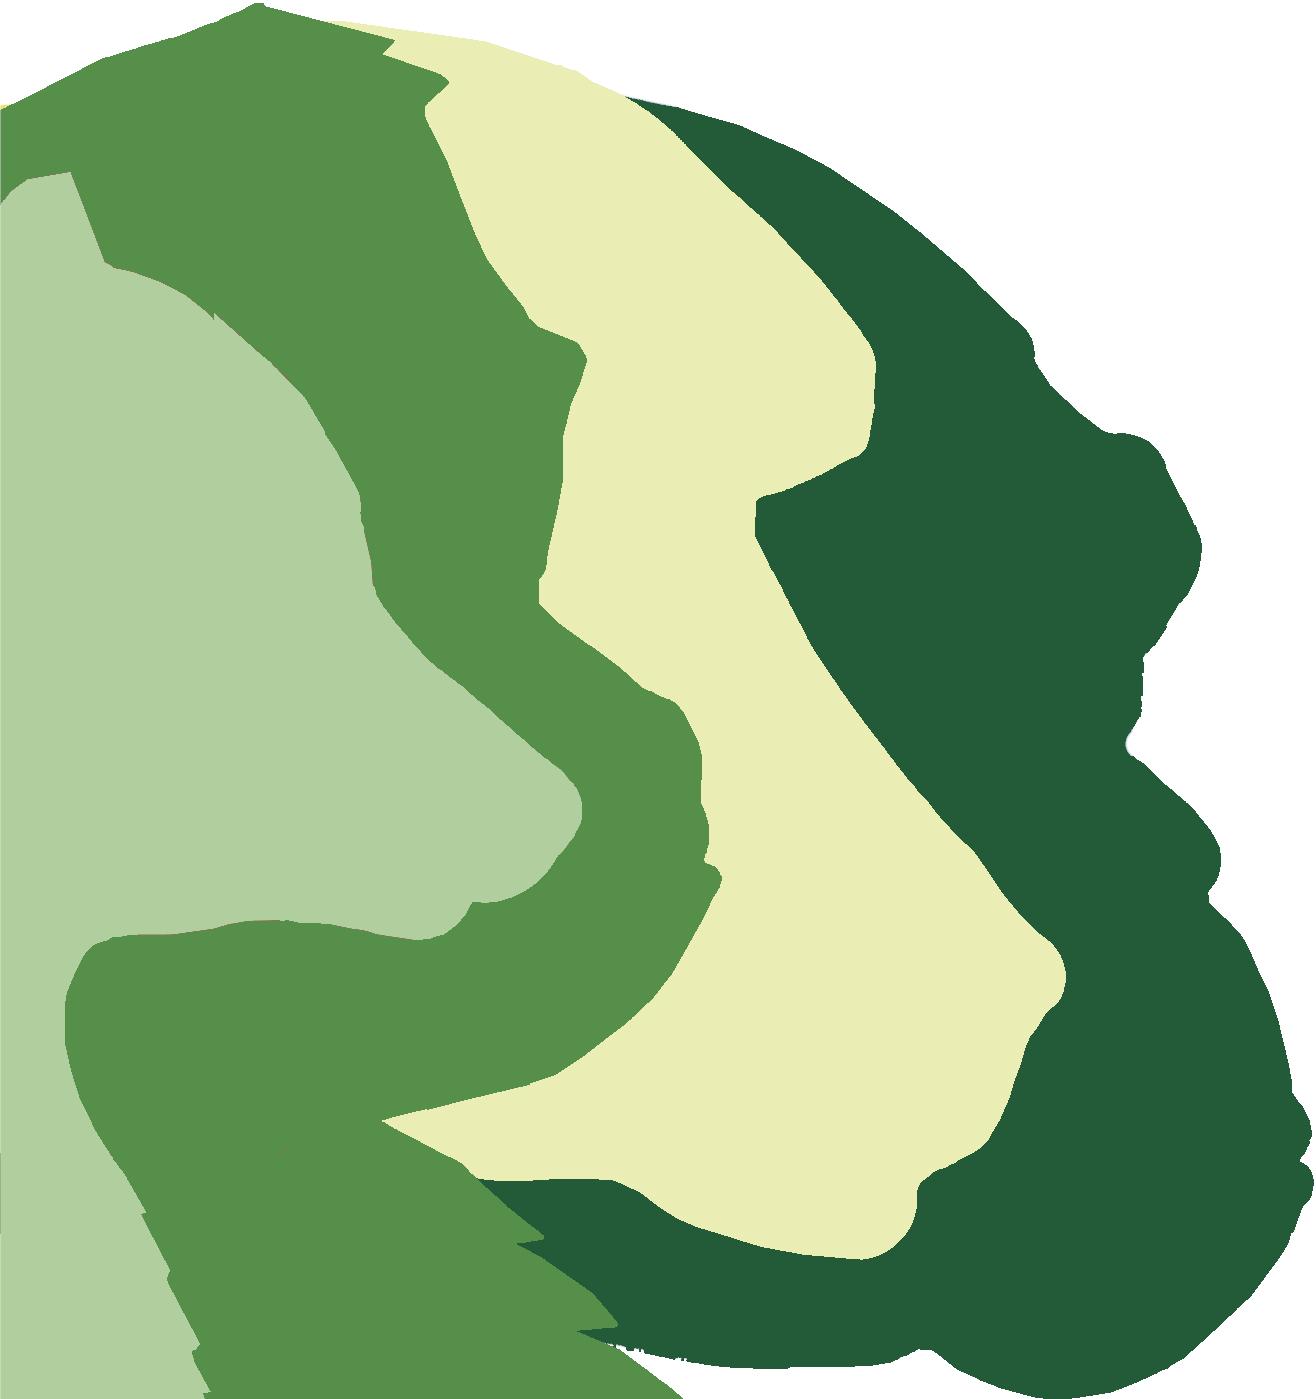 mp_logo_notext.png